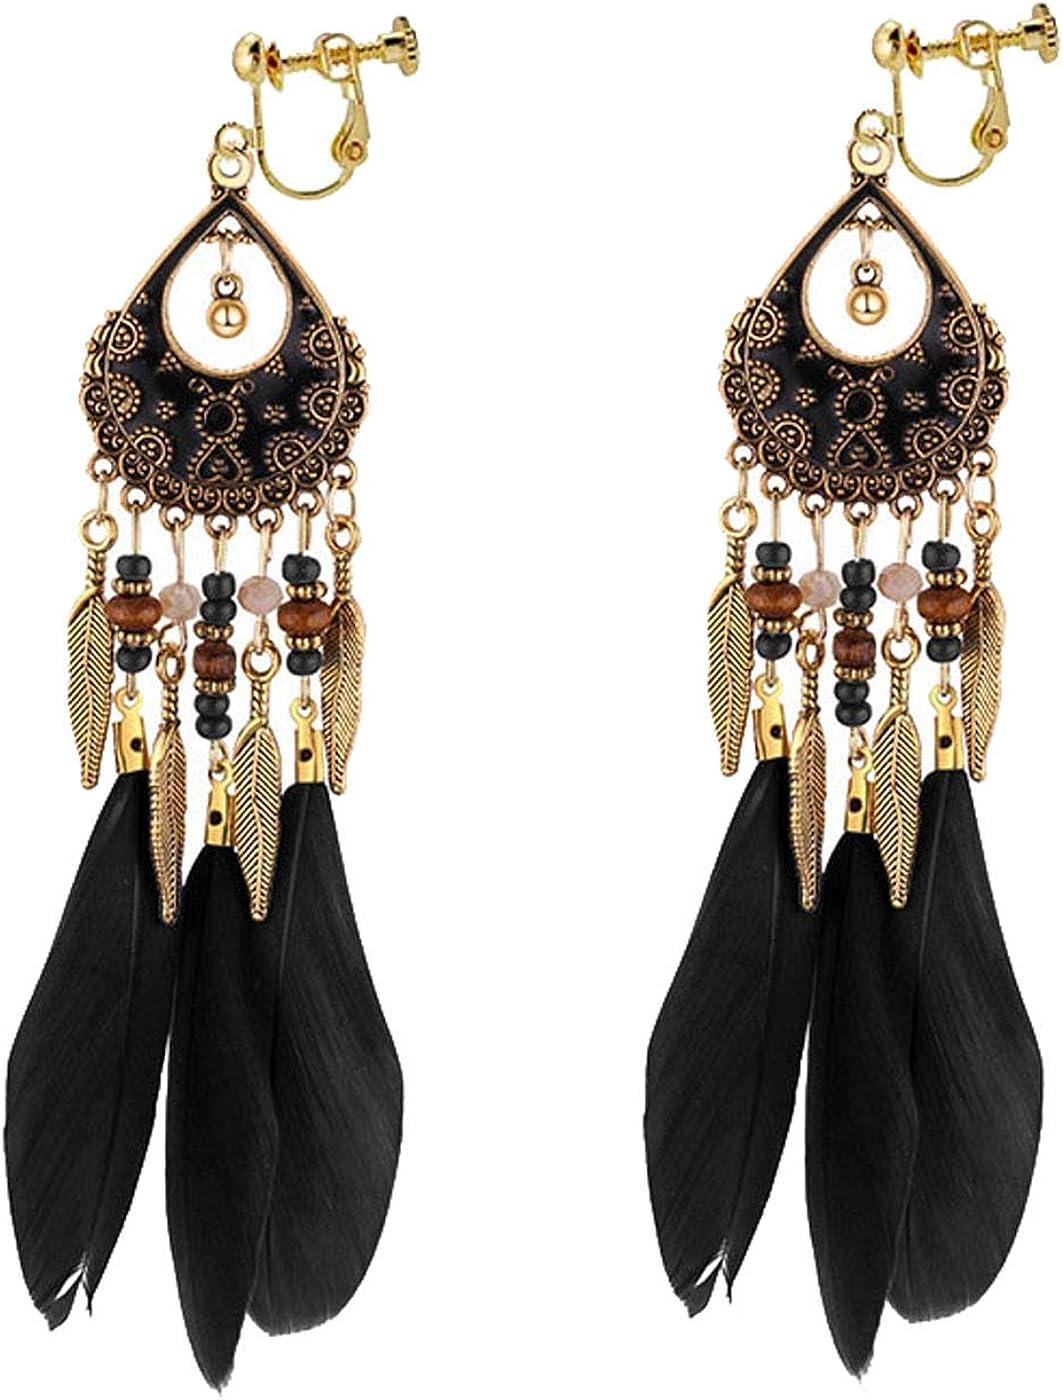 Retro Clip on Earrings Bohemian Earrings for Women Girls Gold Tone Leaf Dangle Drop Long Feather Tassel Vintage Statement Indians